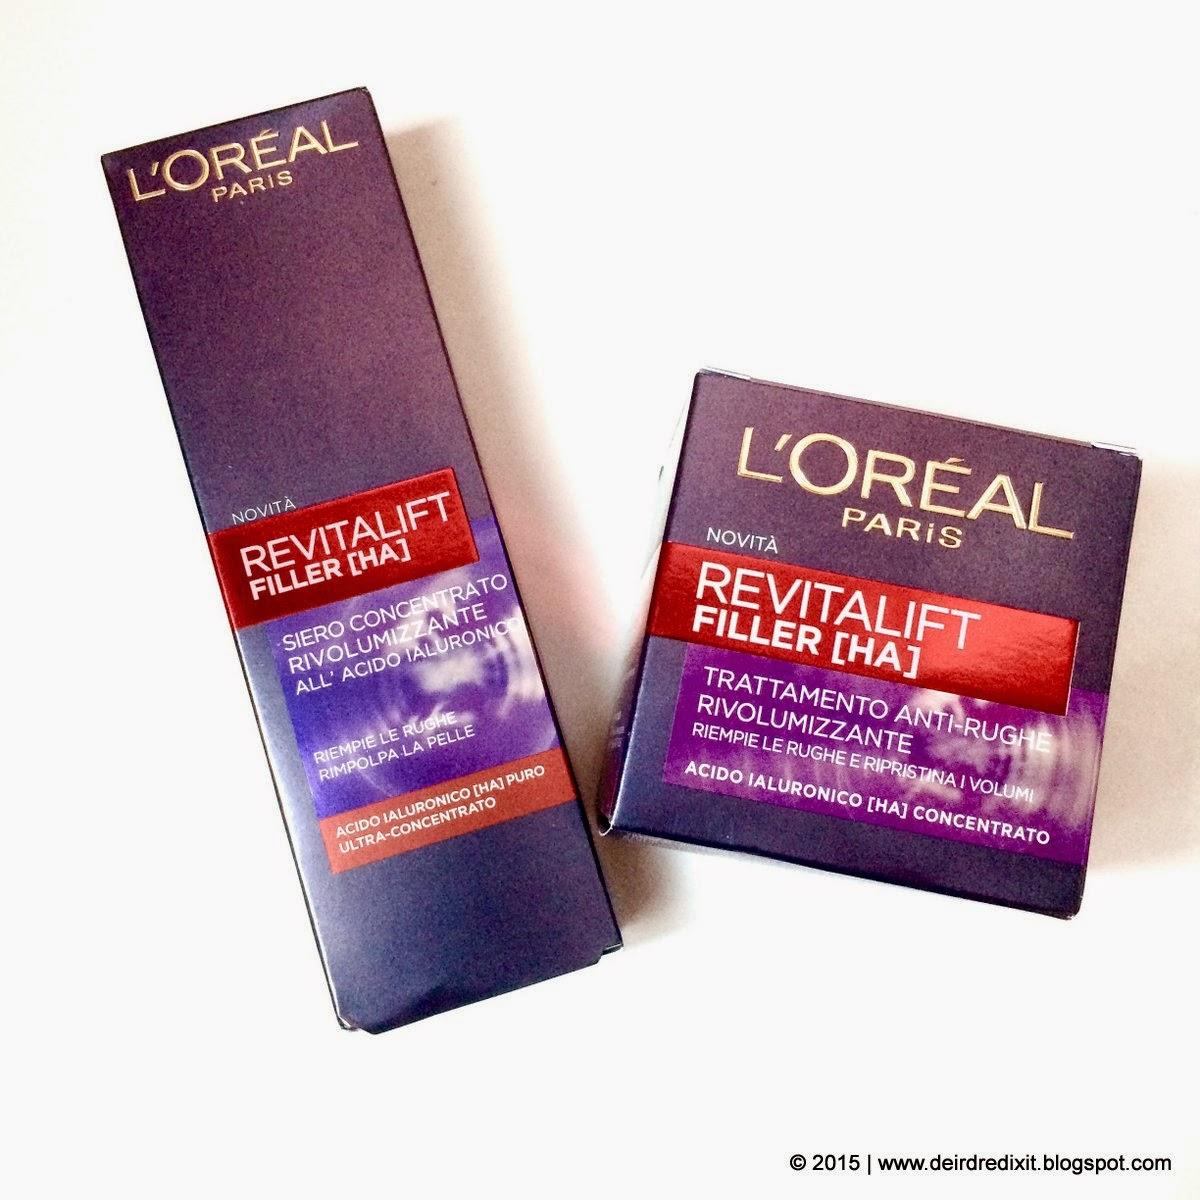 La verità sull'età: L'Oréal Revitalift Filler [HA]